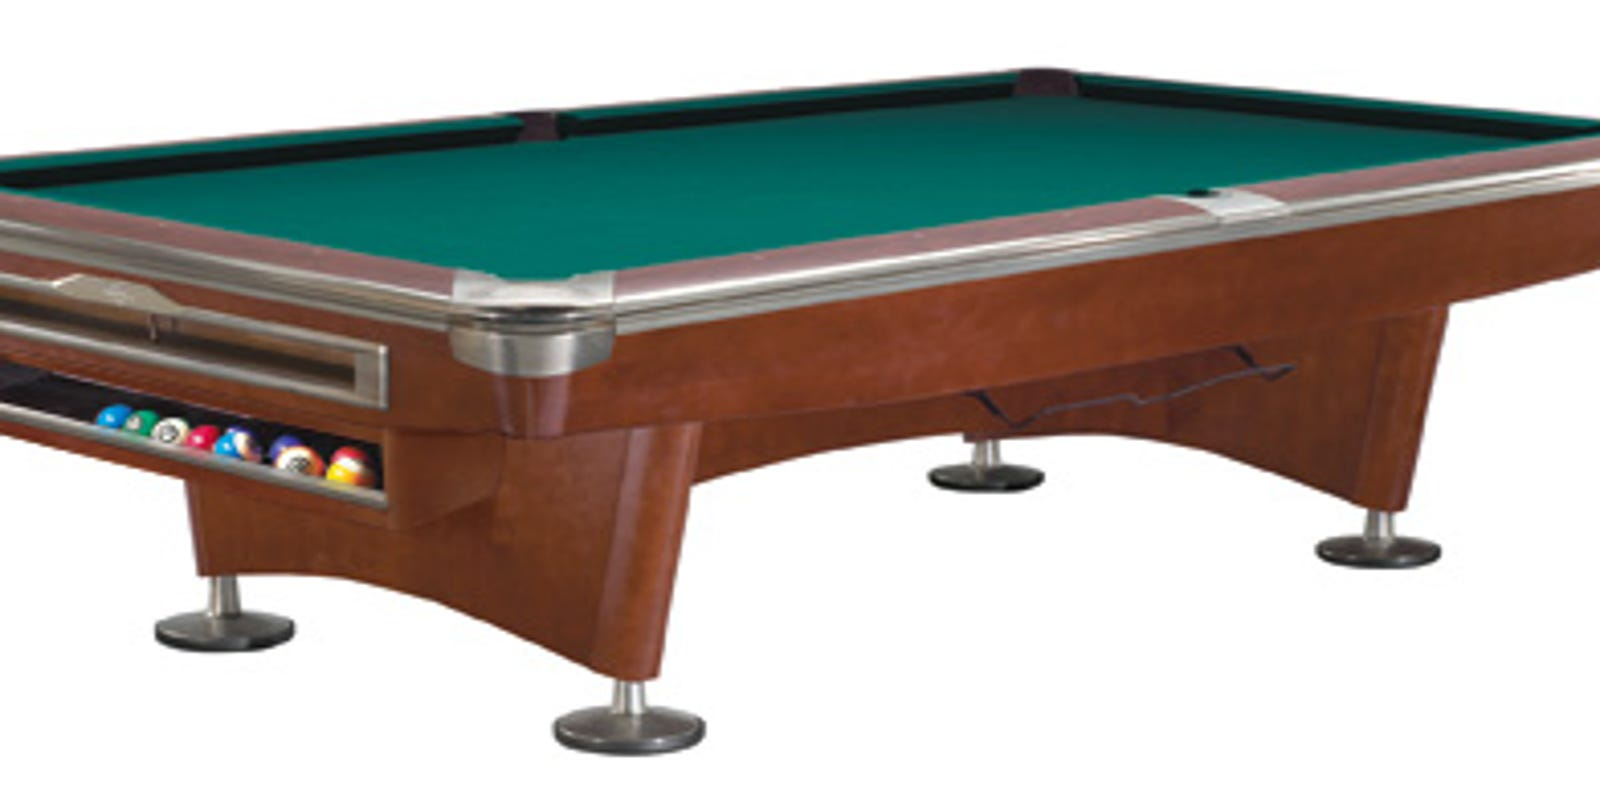 3 Herron Students Vie To Design New Brunswick Pool Table